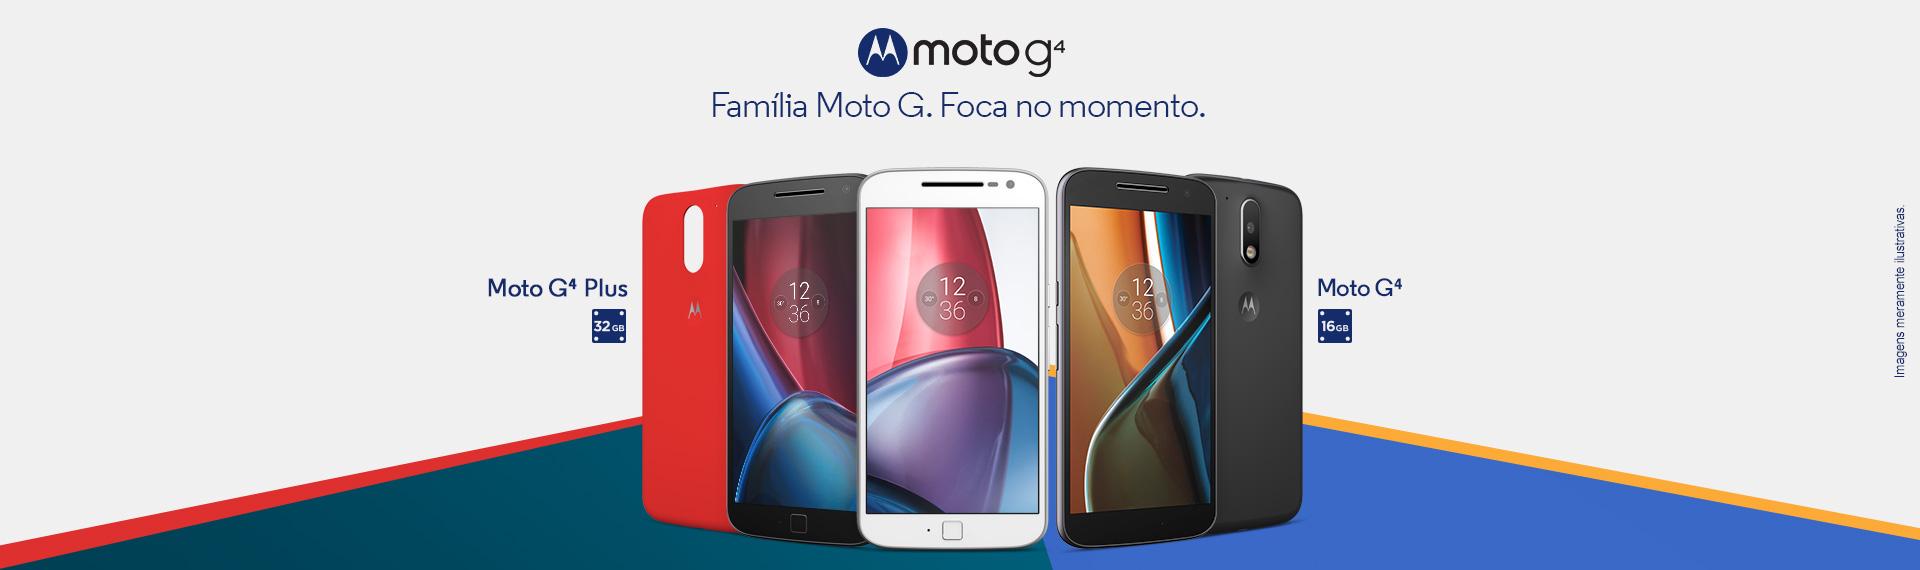 Banner Família MOTO G